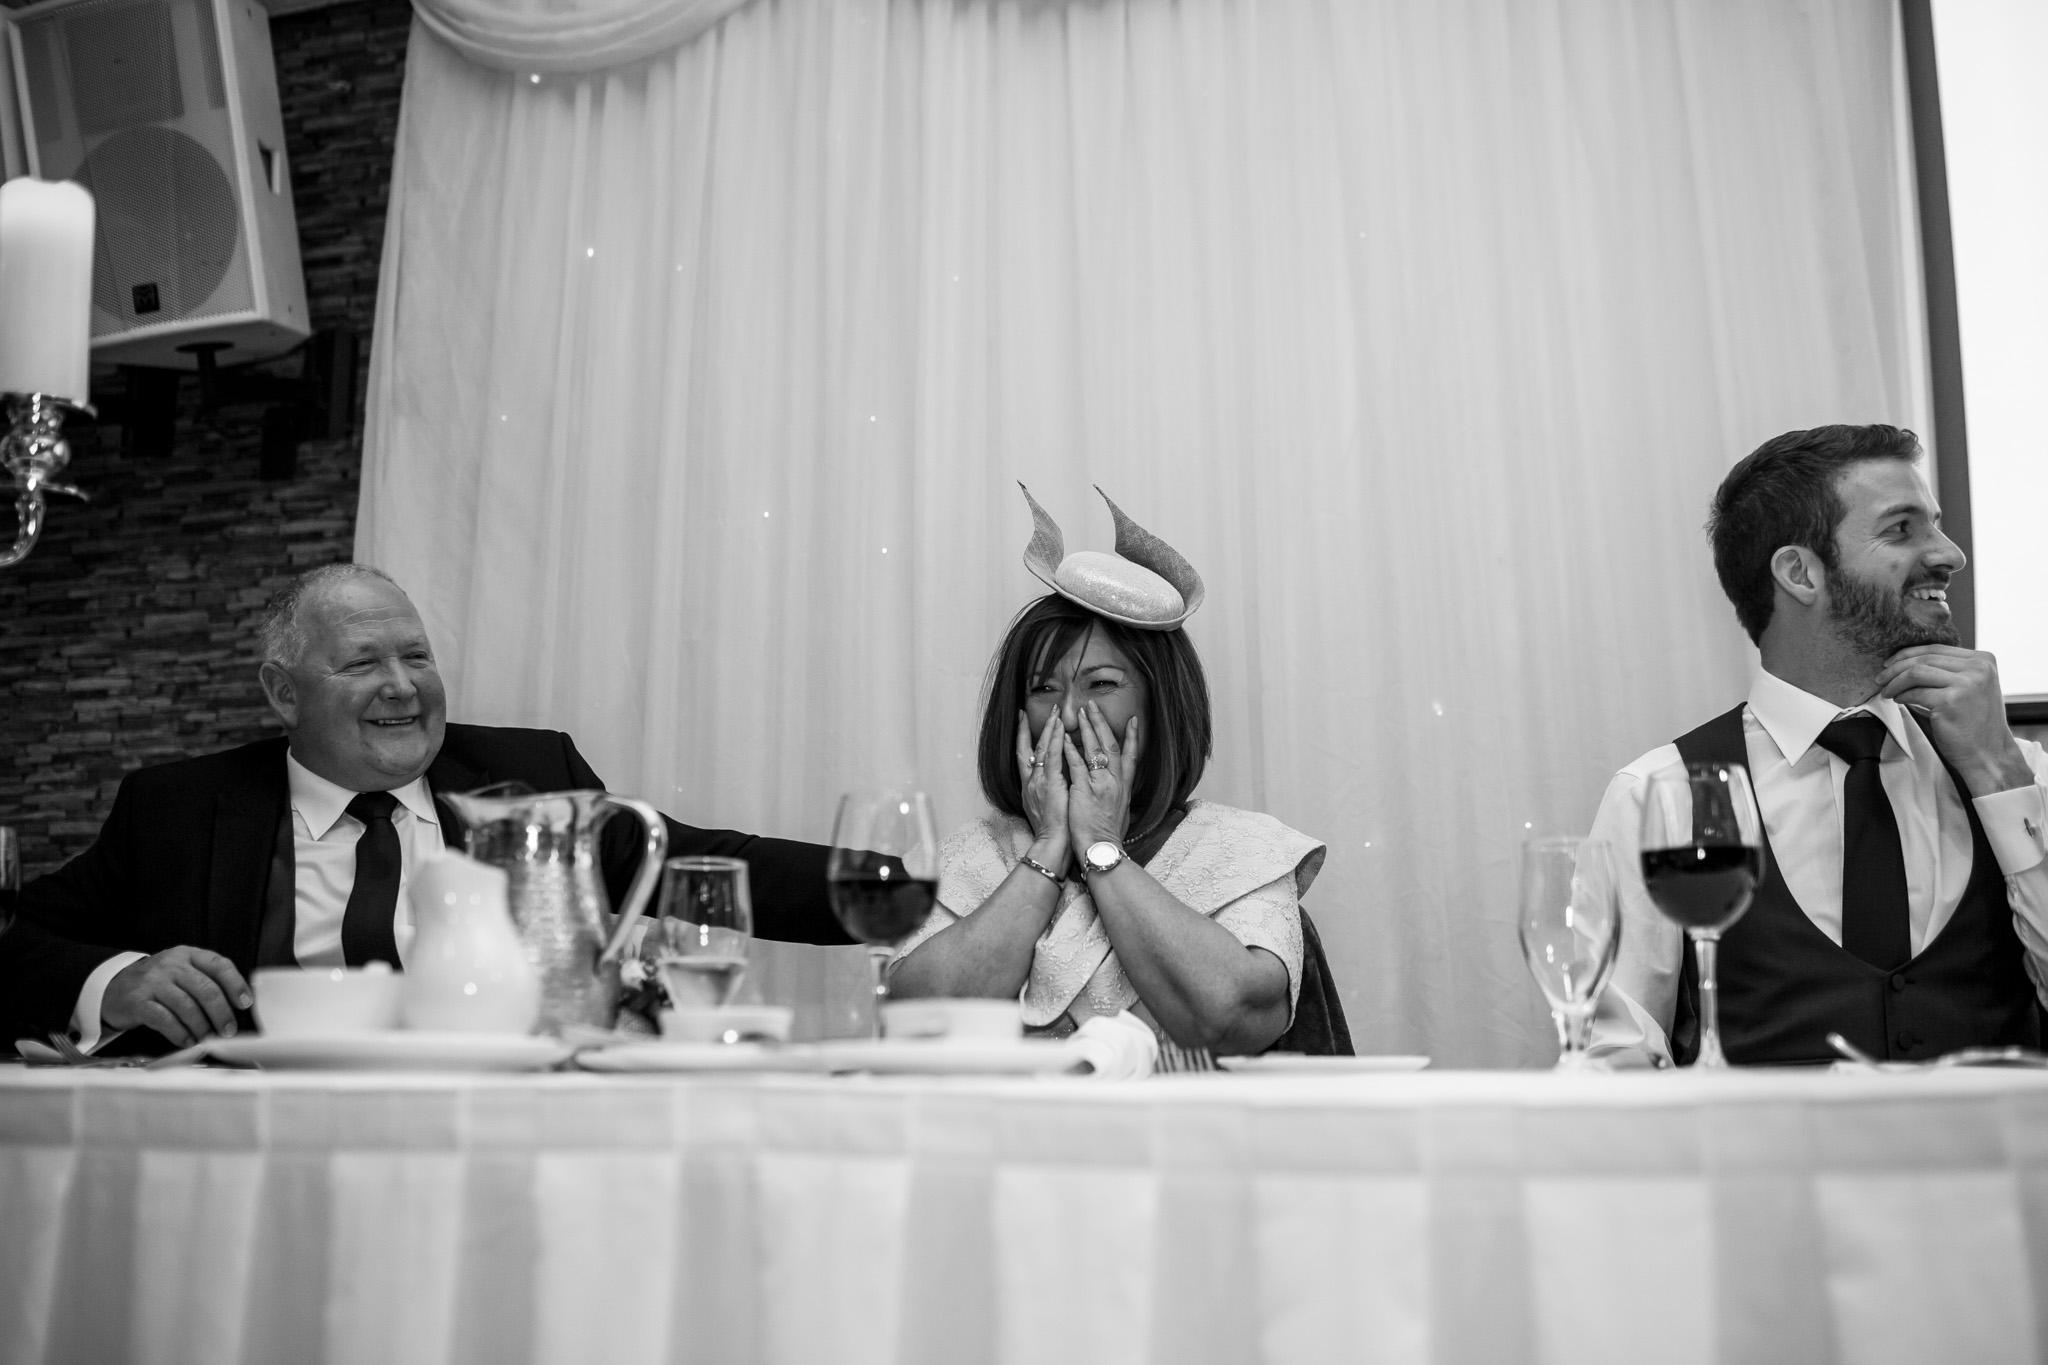 Mark_Barnes_Northern_Ireland_wedding_photographer_Harveys_Point_Donegall_Wedding_photography-Adam&Gemma-51.jpg